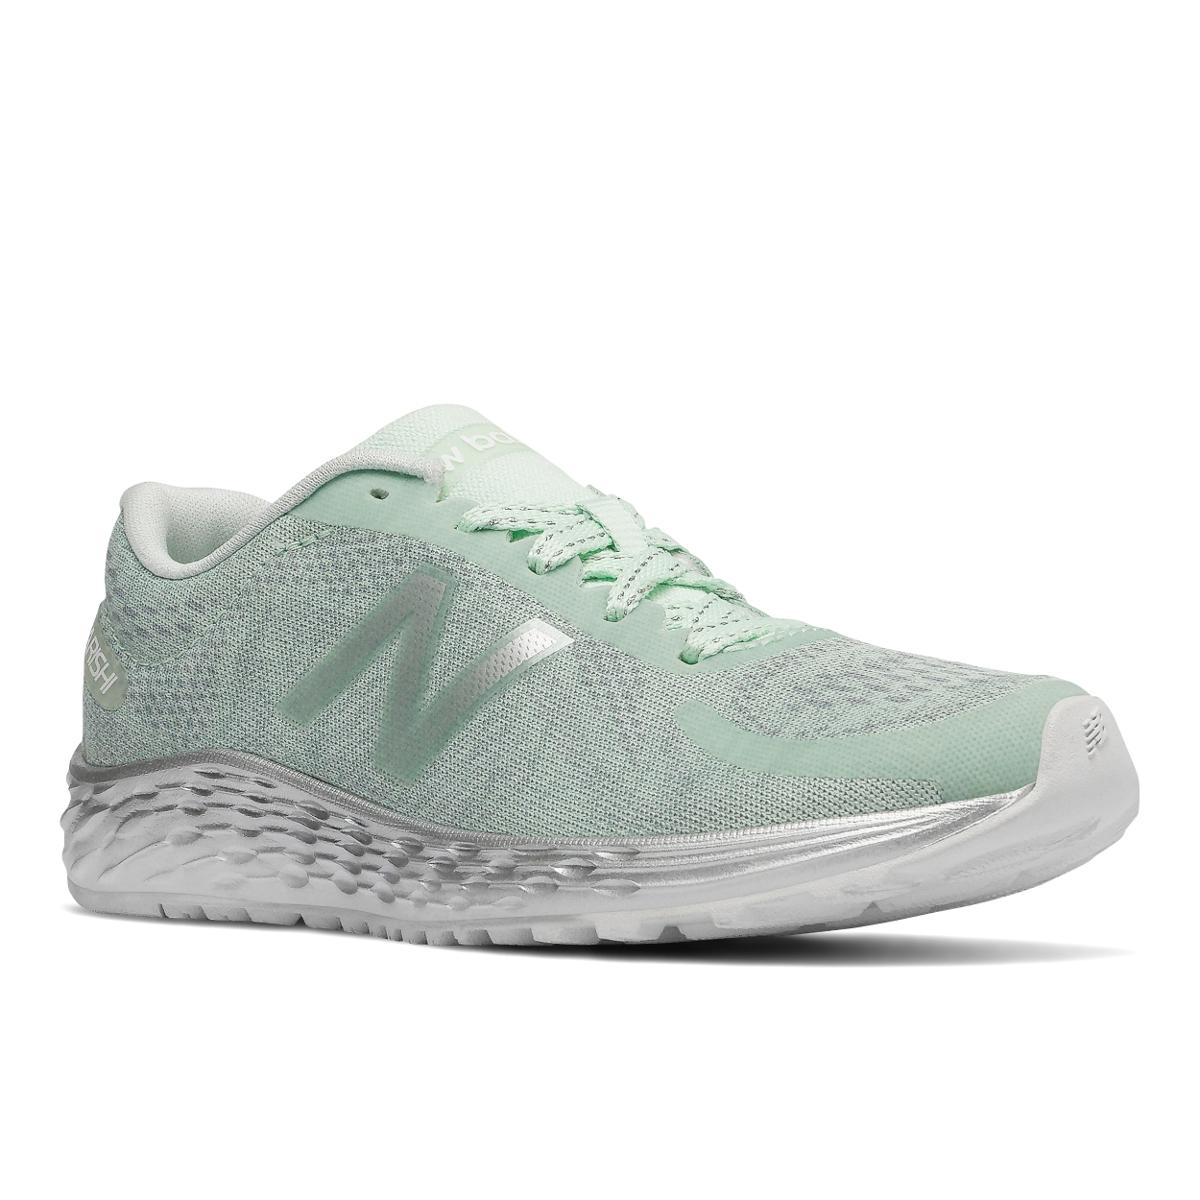 New Balance Big Girls' Grade School Fresh Foam Arishi Running Shoes - Green, 5.5